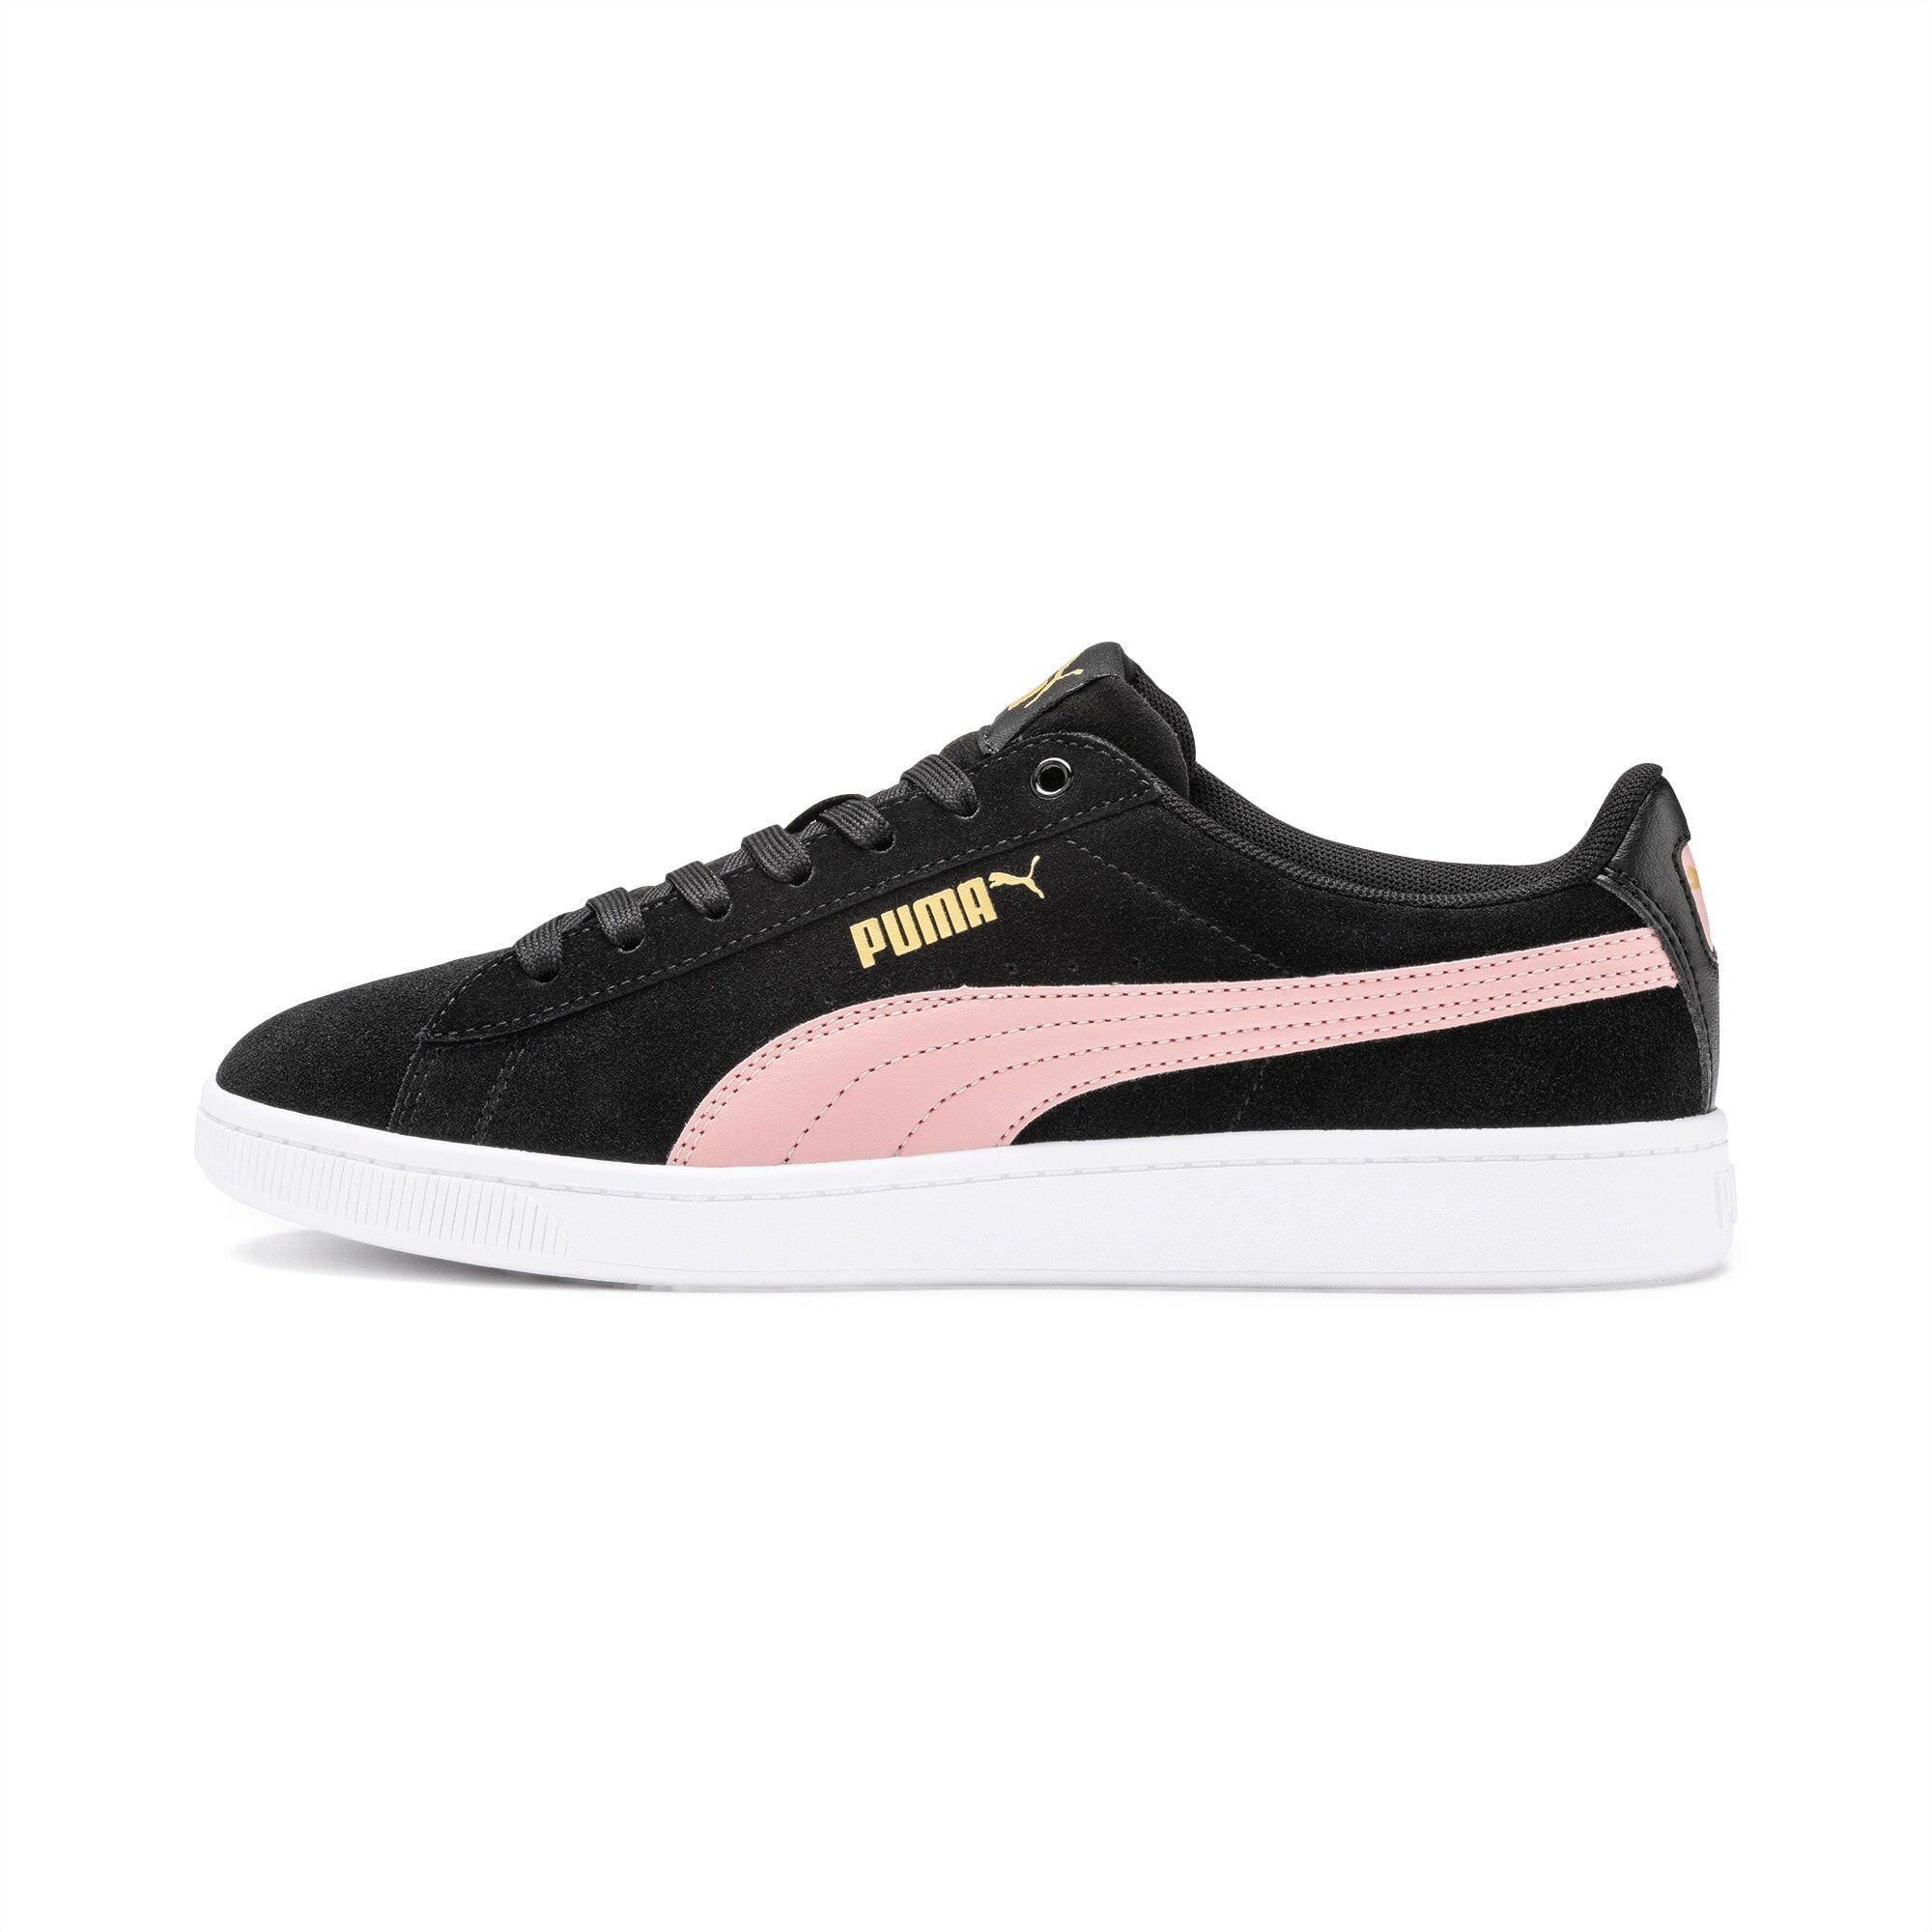 PUMA Chaussure Basket Vikky v2 pour Femme, Blanc/Rose/Noir, Taille 37.5, Chaussures